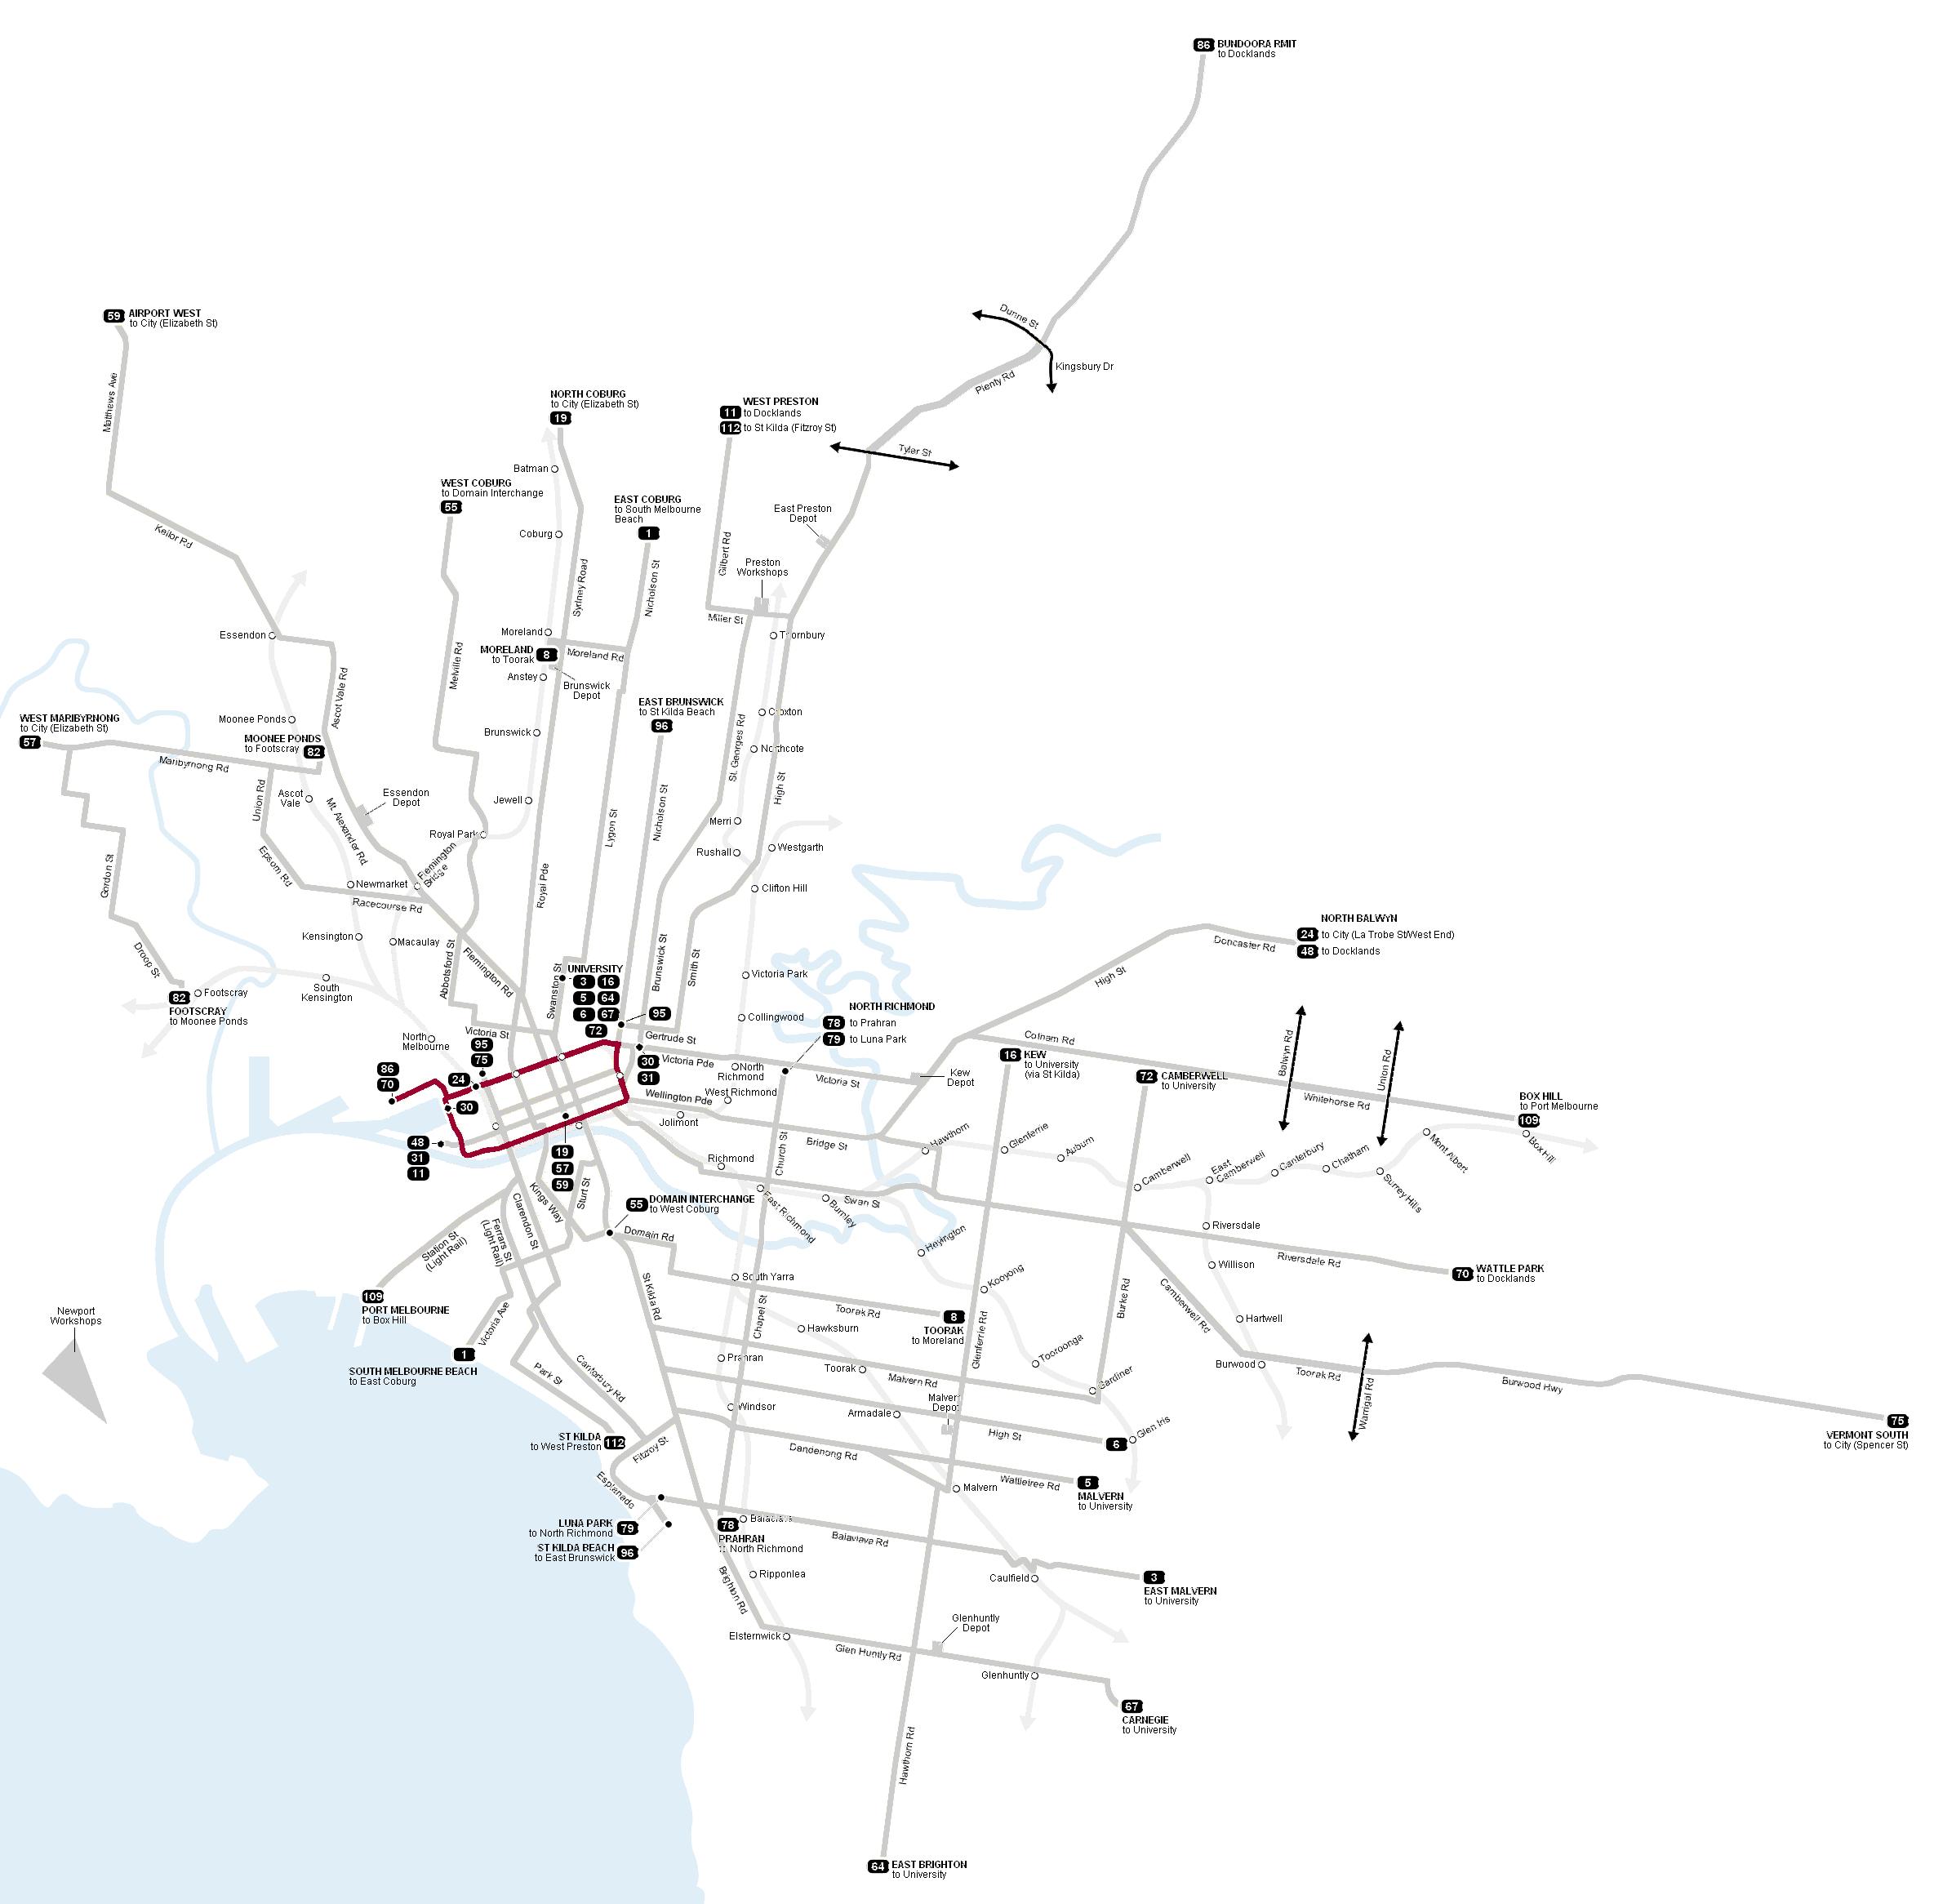 map of pilot 2 area